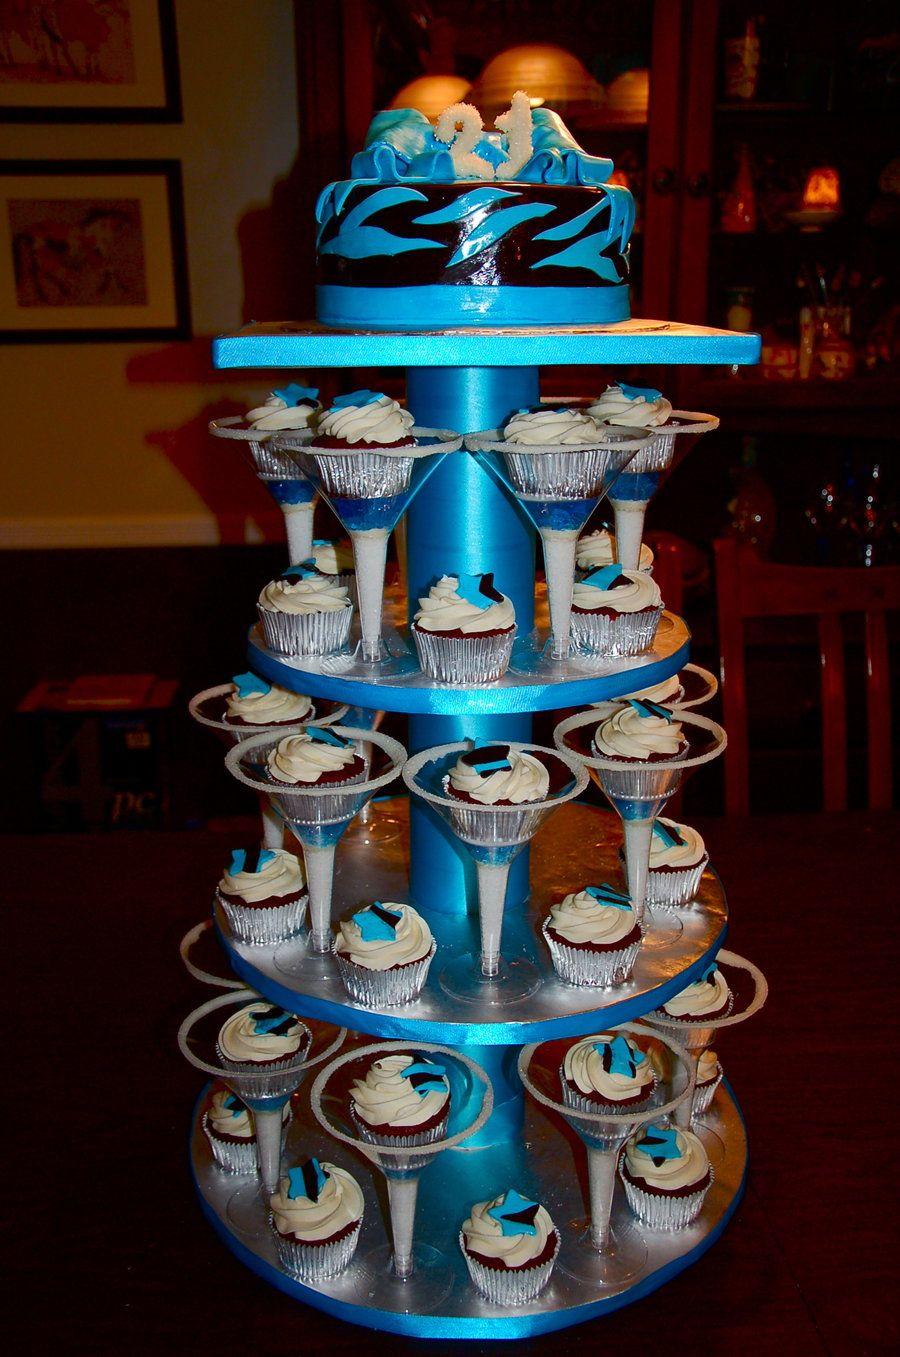 21st Birthday Cupcakes Full Display By Keep It Sweetdeviantart On